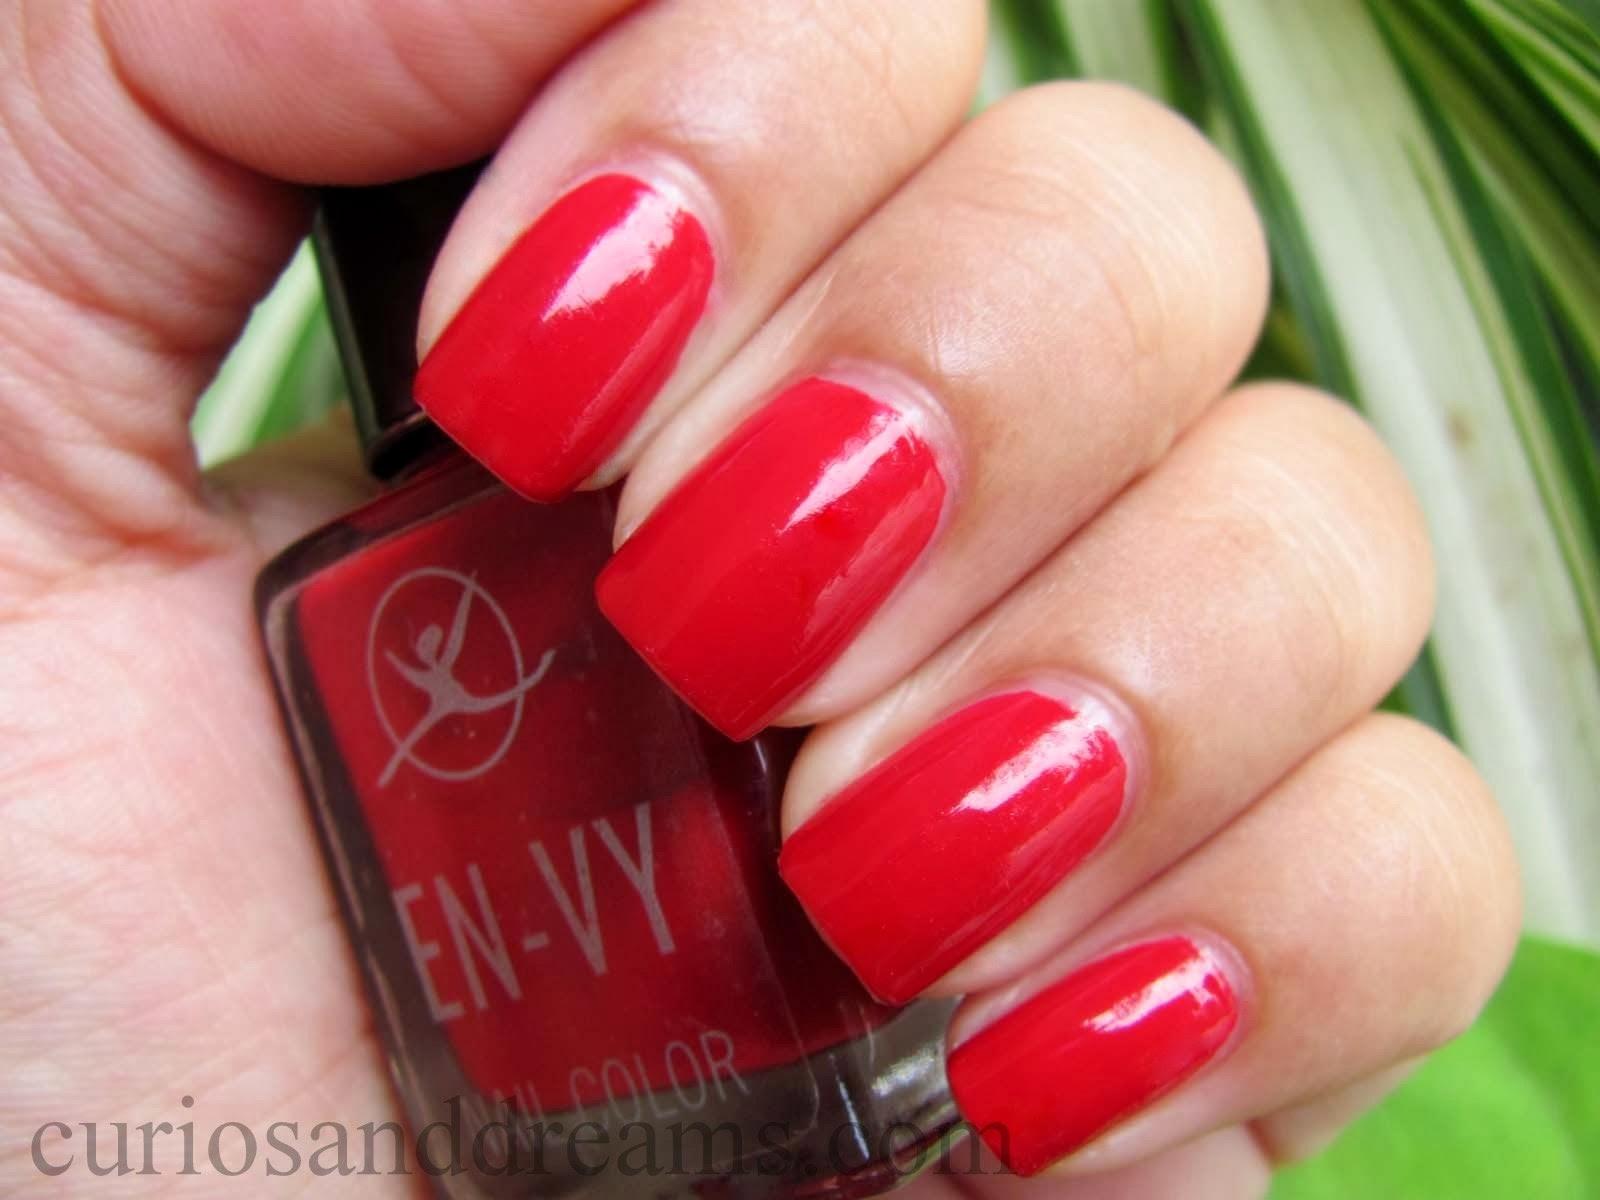 EN-VY Nail Color Ooh La La Red review, red nailpolish review